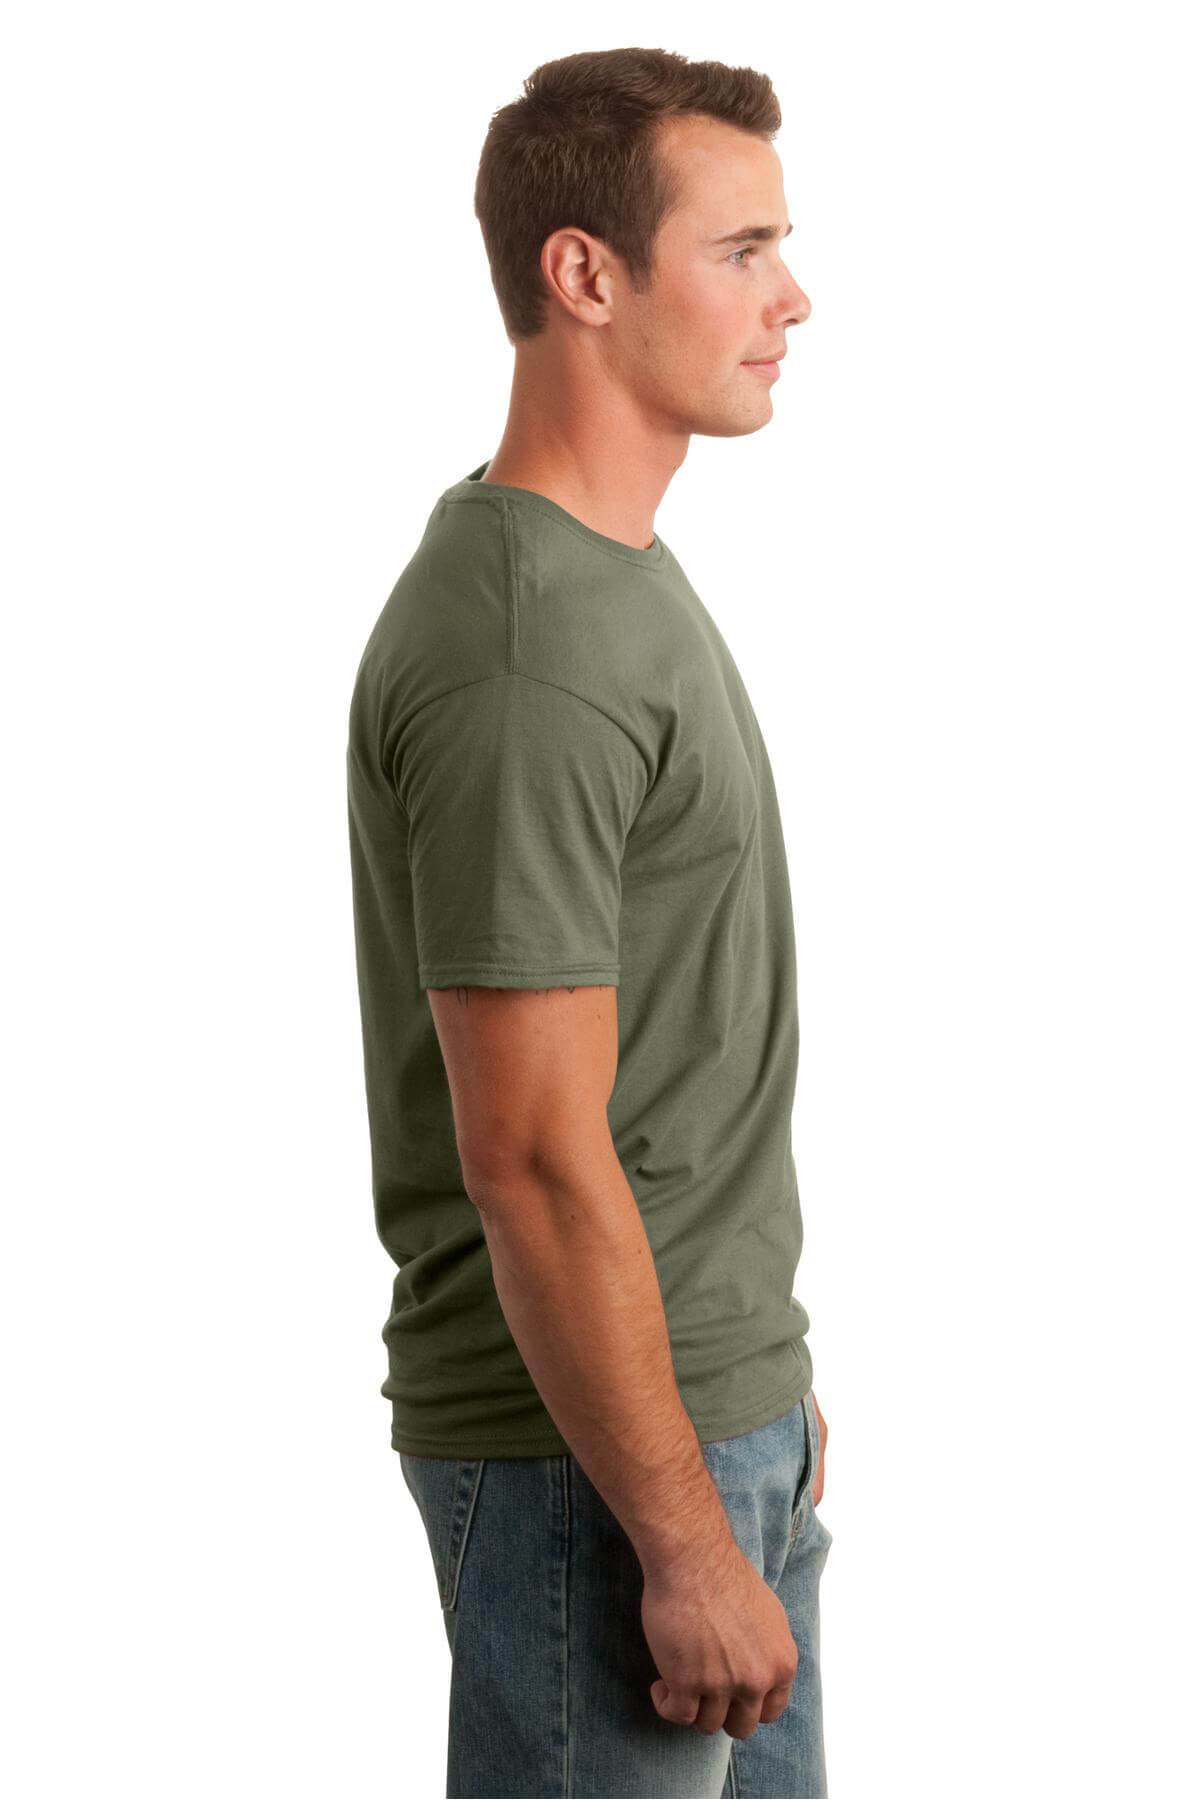 Military Green T-Shirt Model Right